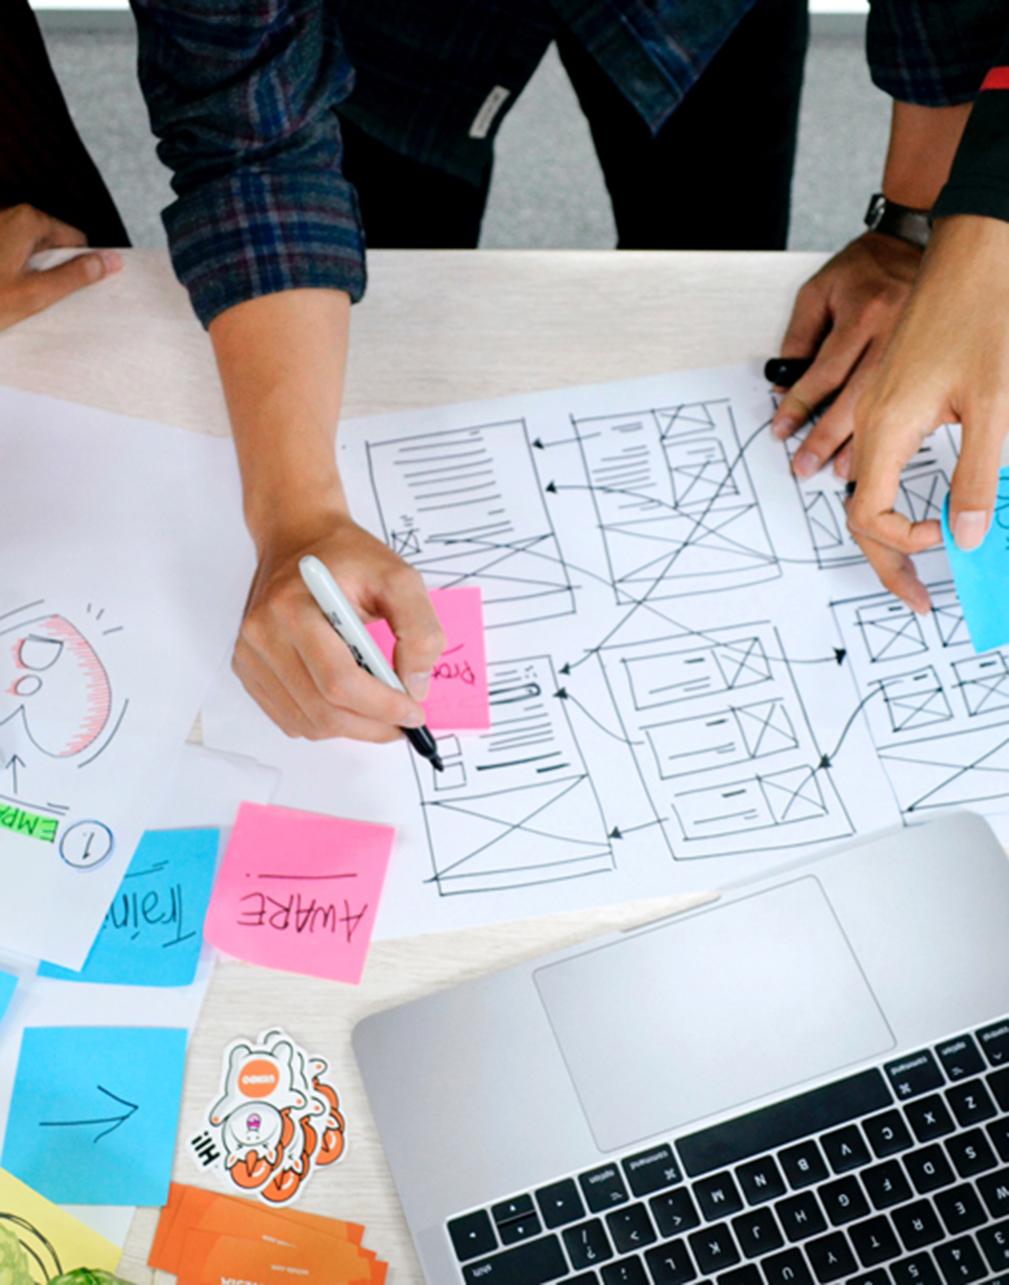 Multiple people working on a websites UX frames